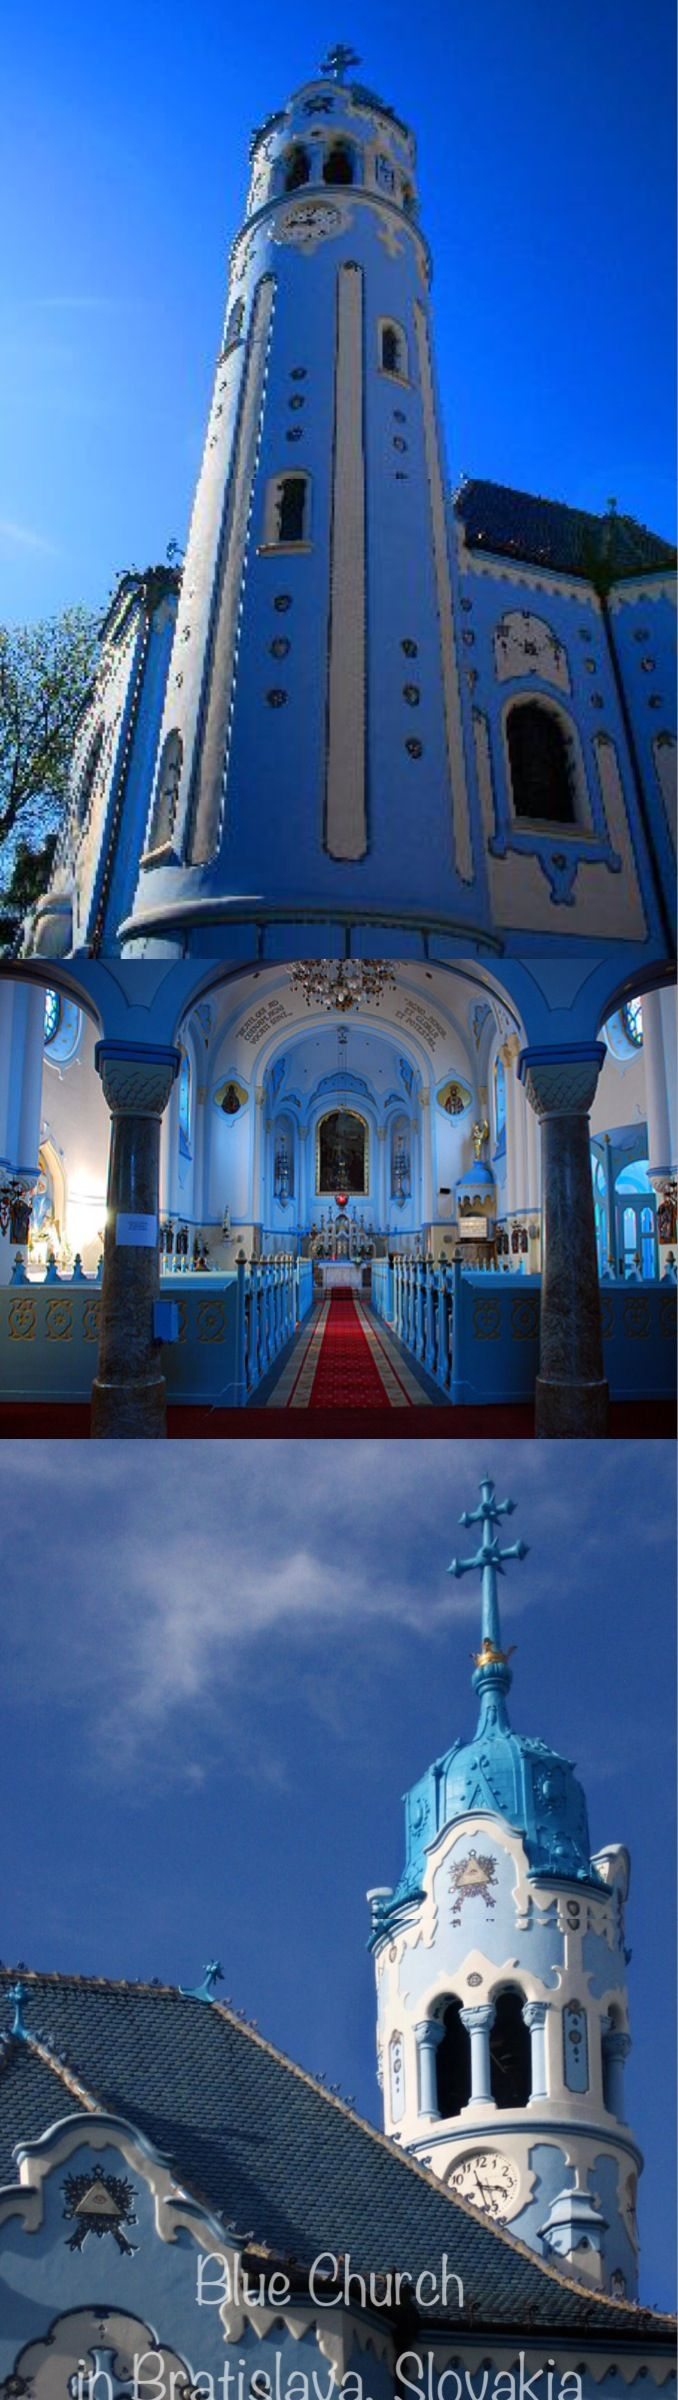 Blue Church in Bratislava, Slovakia